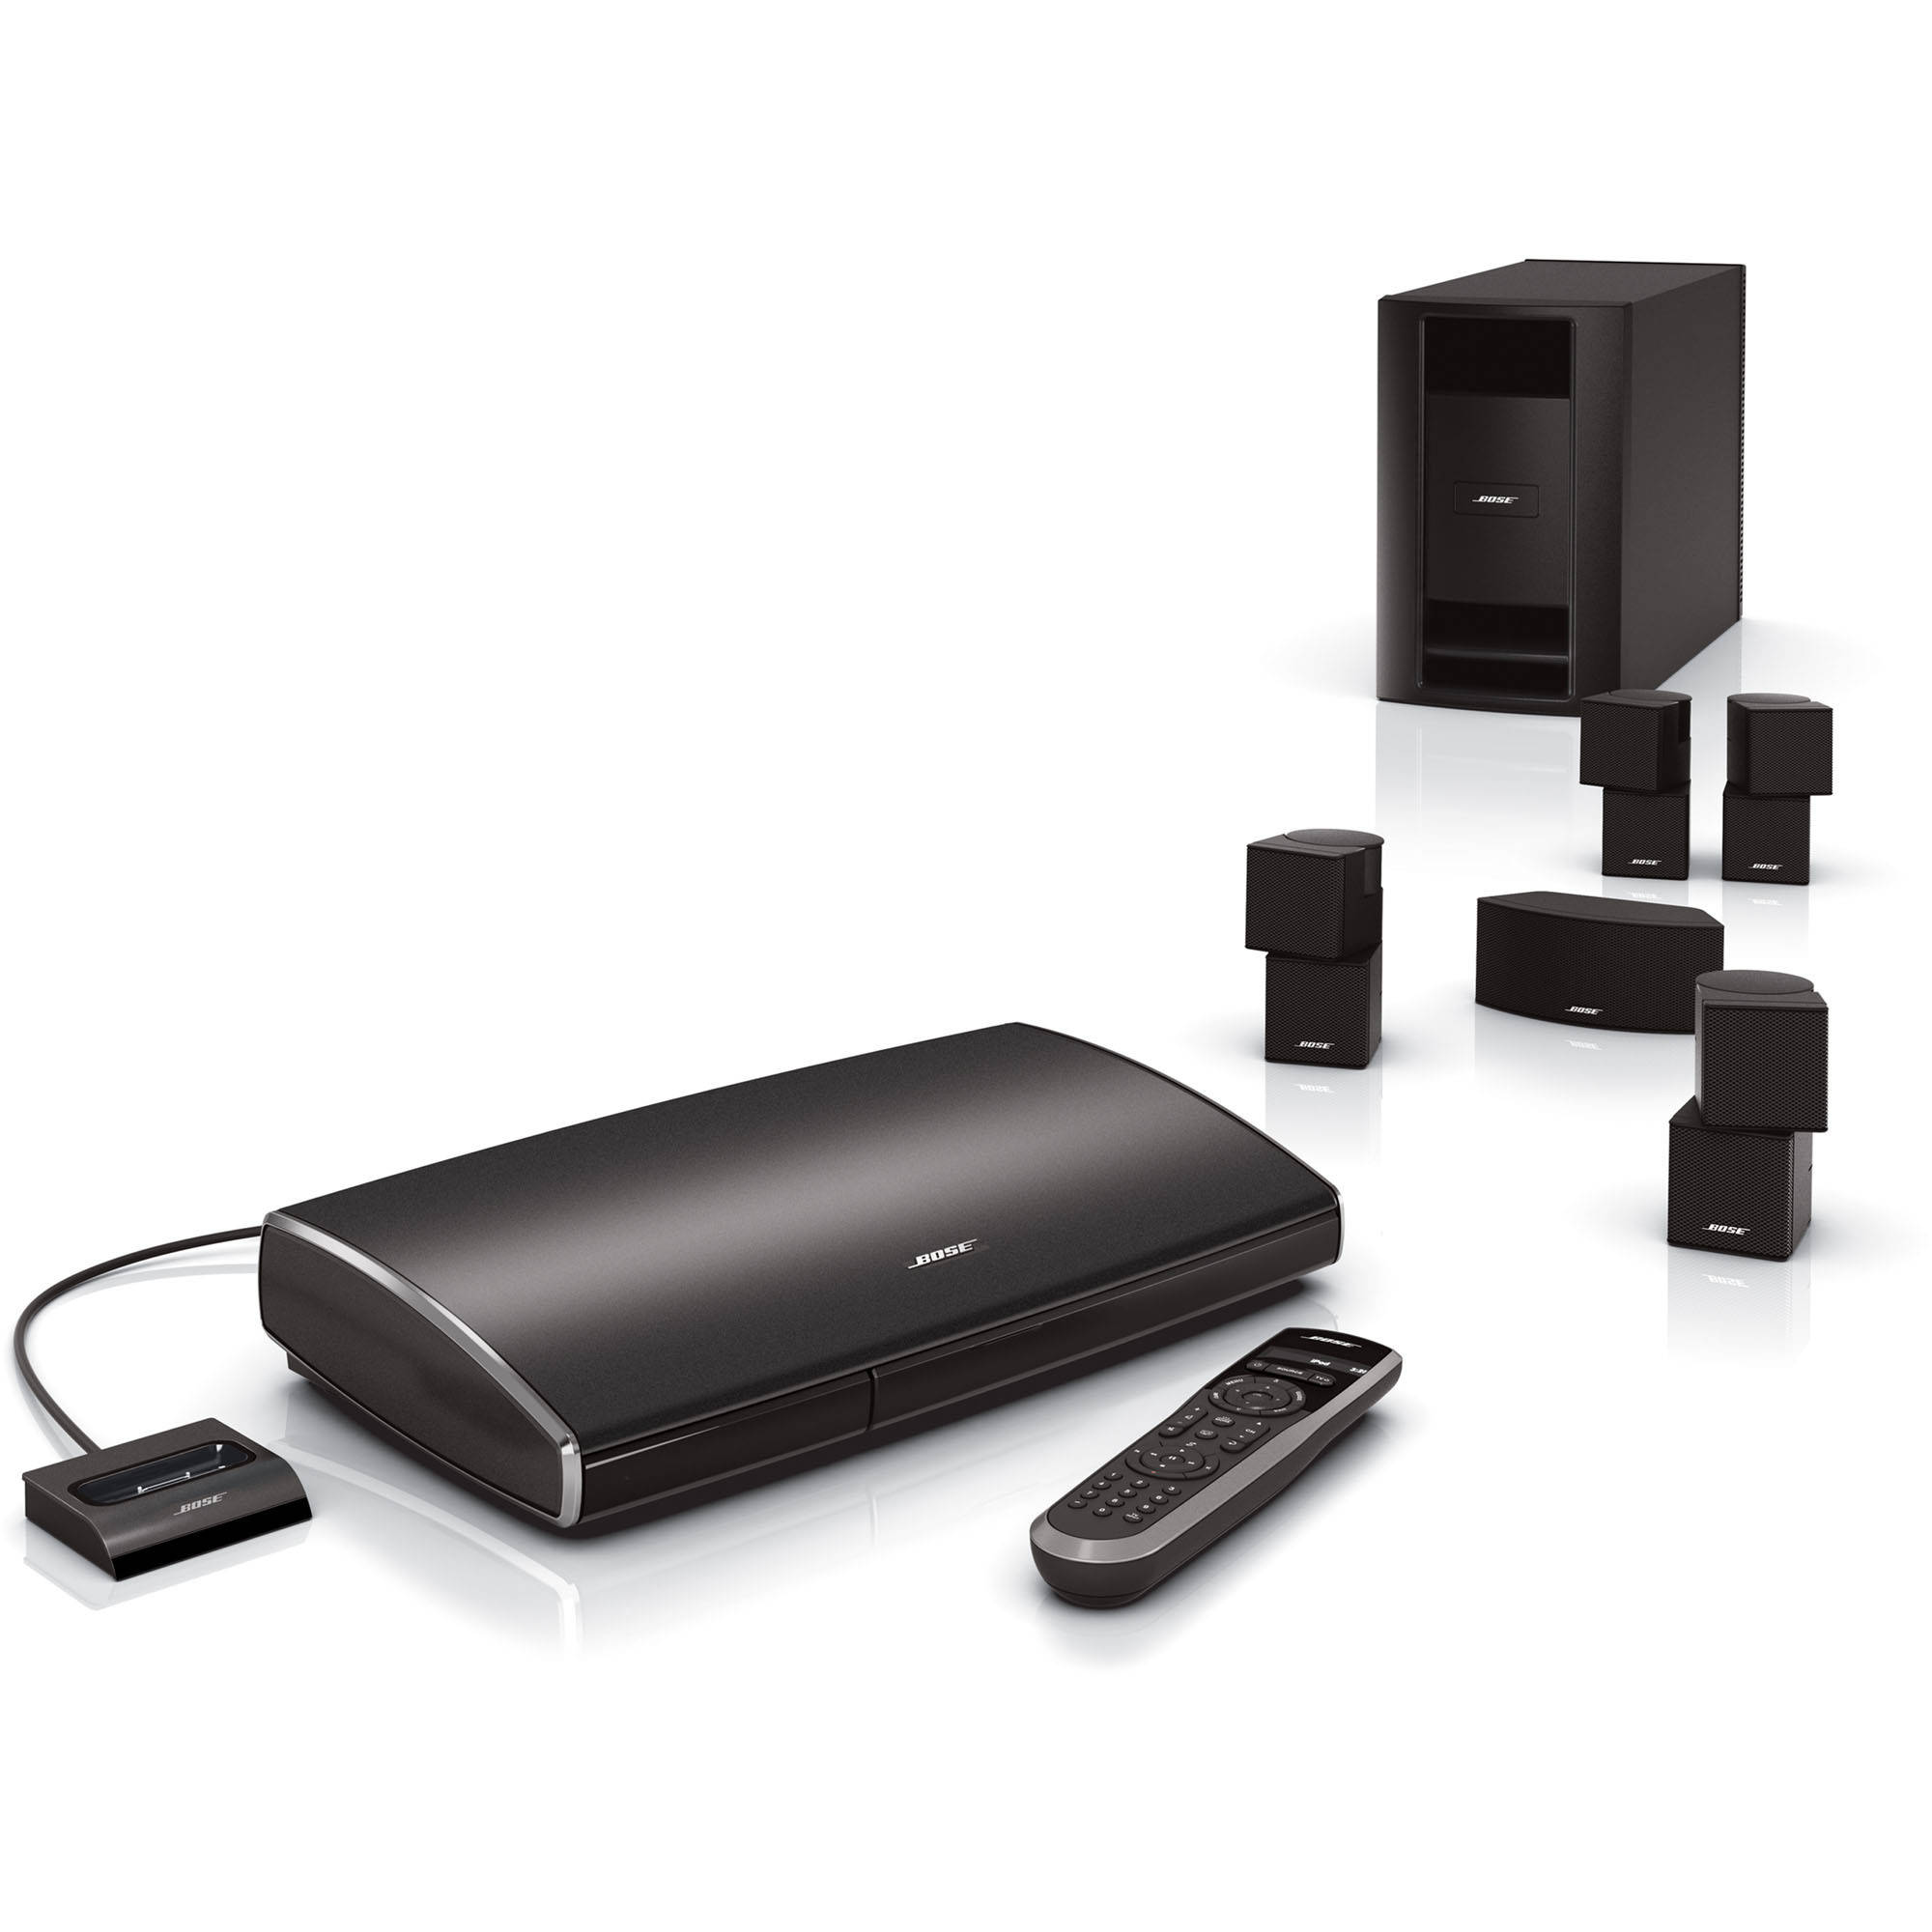 bose lifestyle v35 home entertainment system 317642 1100 b h. Black Bedroom Furniture Sets. Home Design Ideas